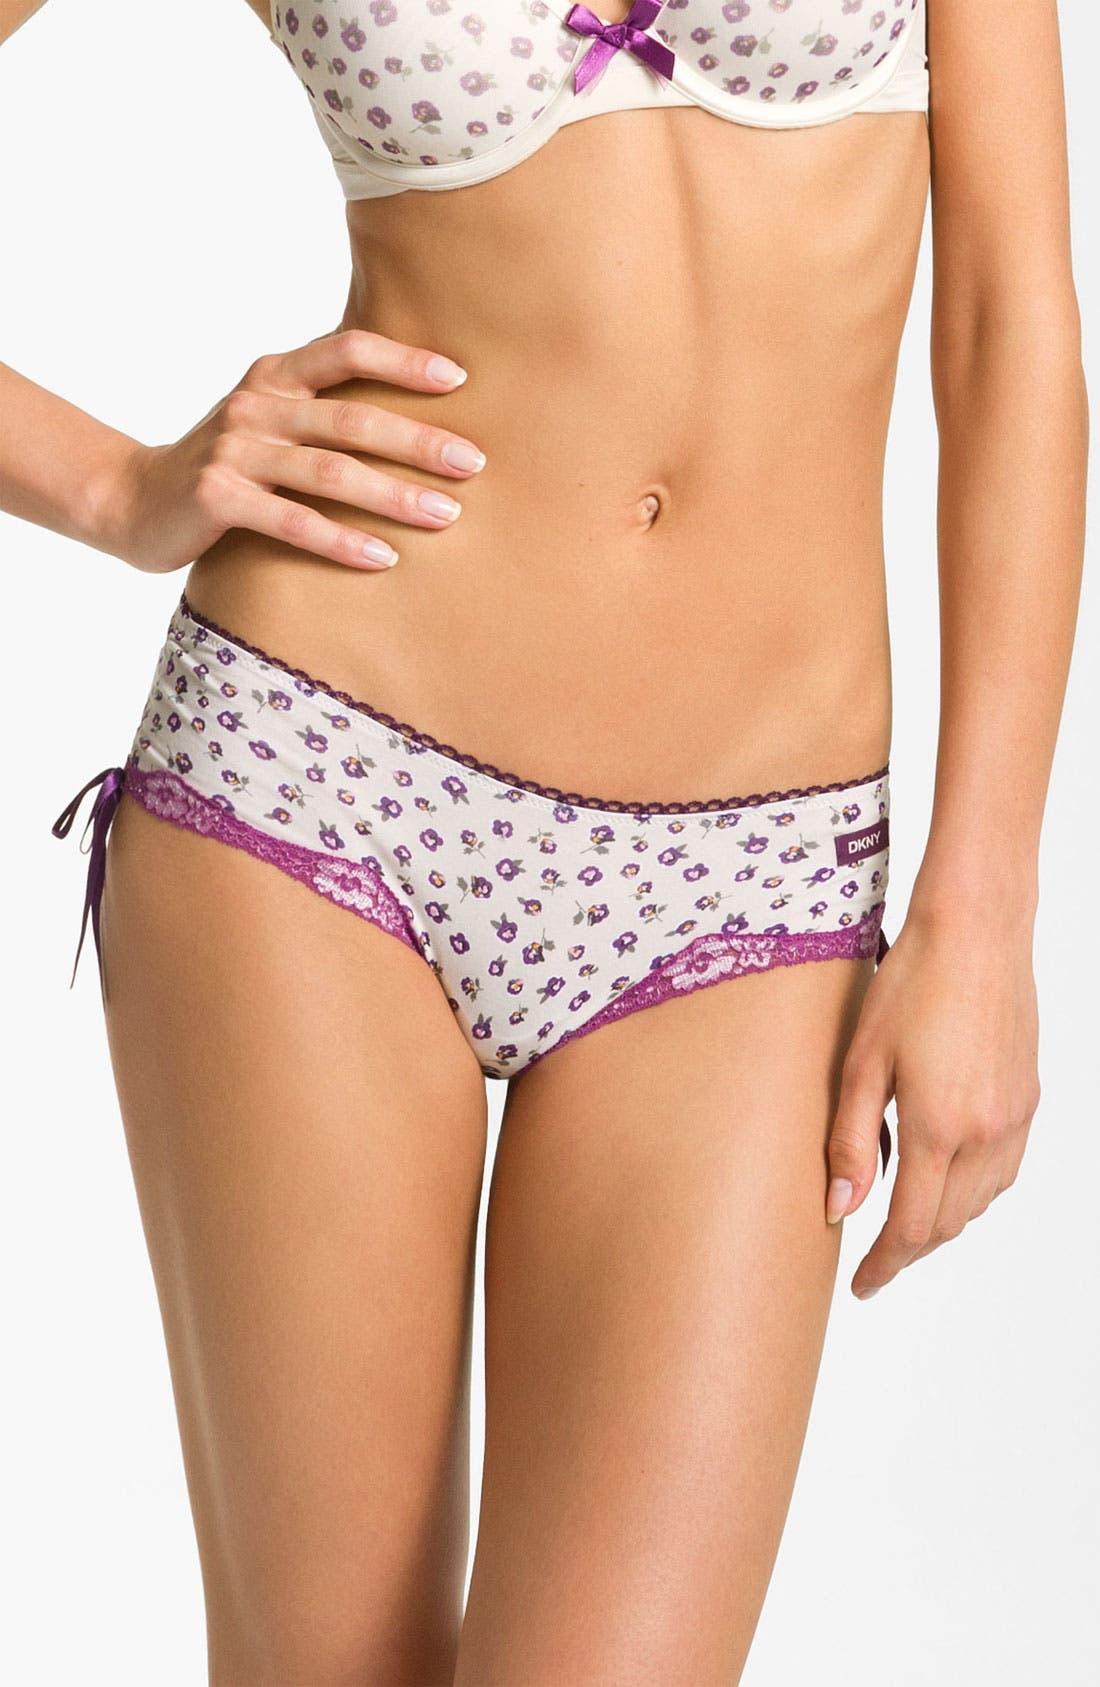 Alternate Image 1 Selected - DKNY 'Cutie' Cotton Bikini (3 for $27)